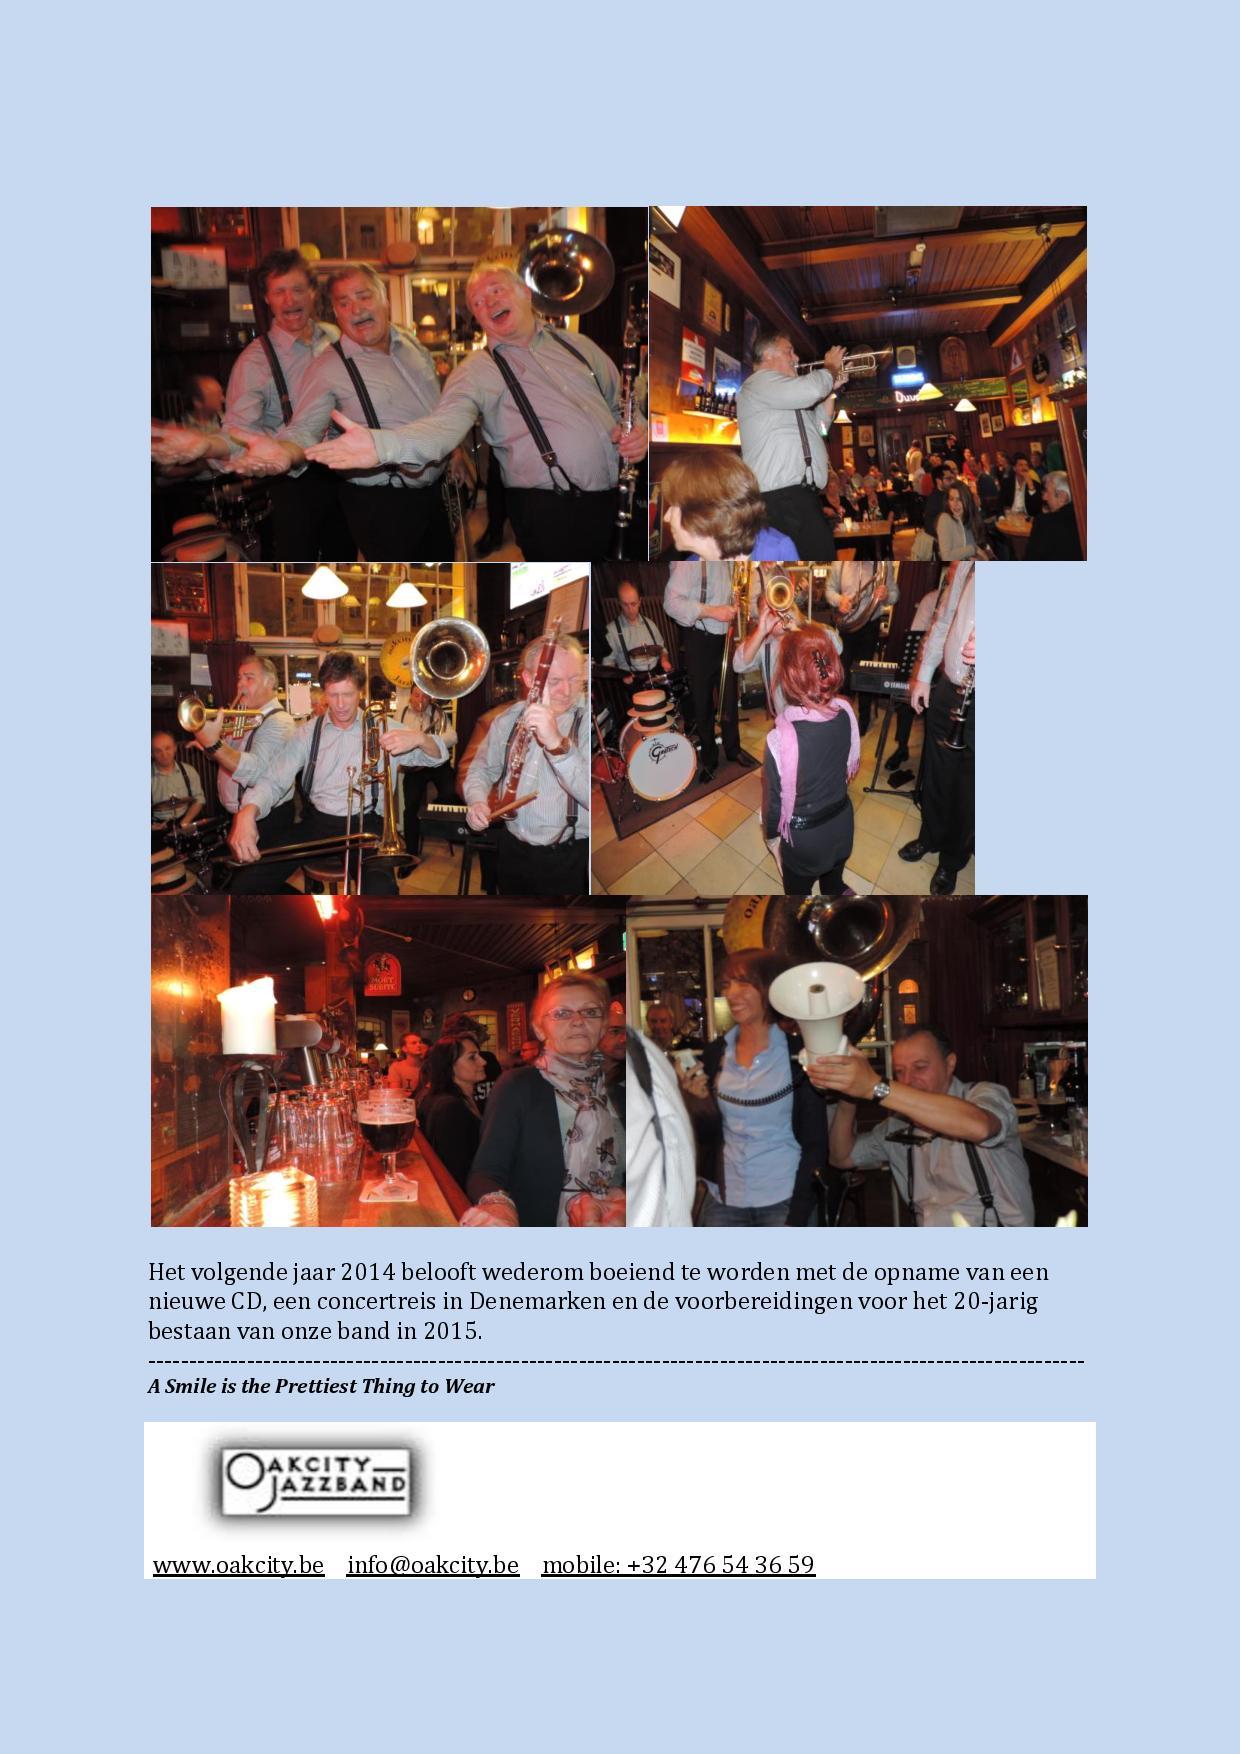 Nieuwsbrief Oakcity Jazzband najaar 2013-page-003